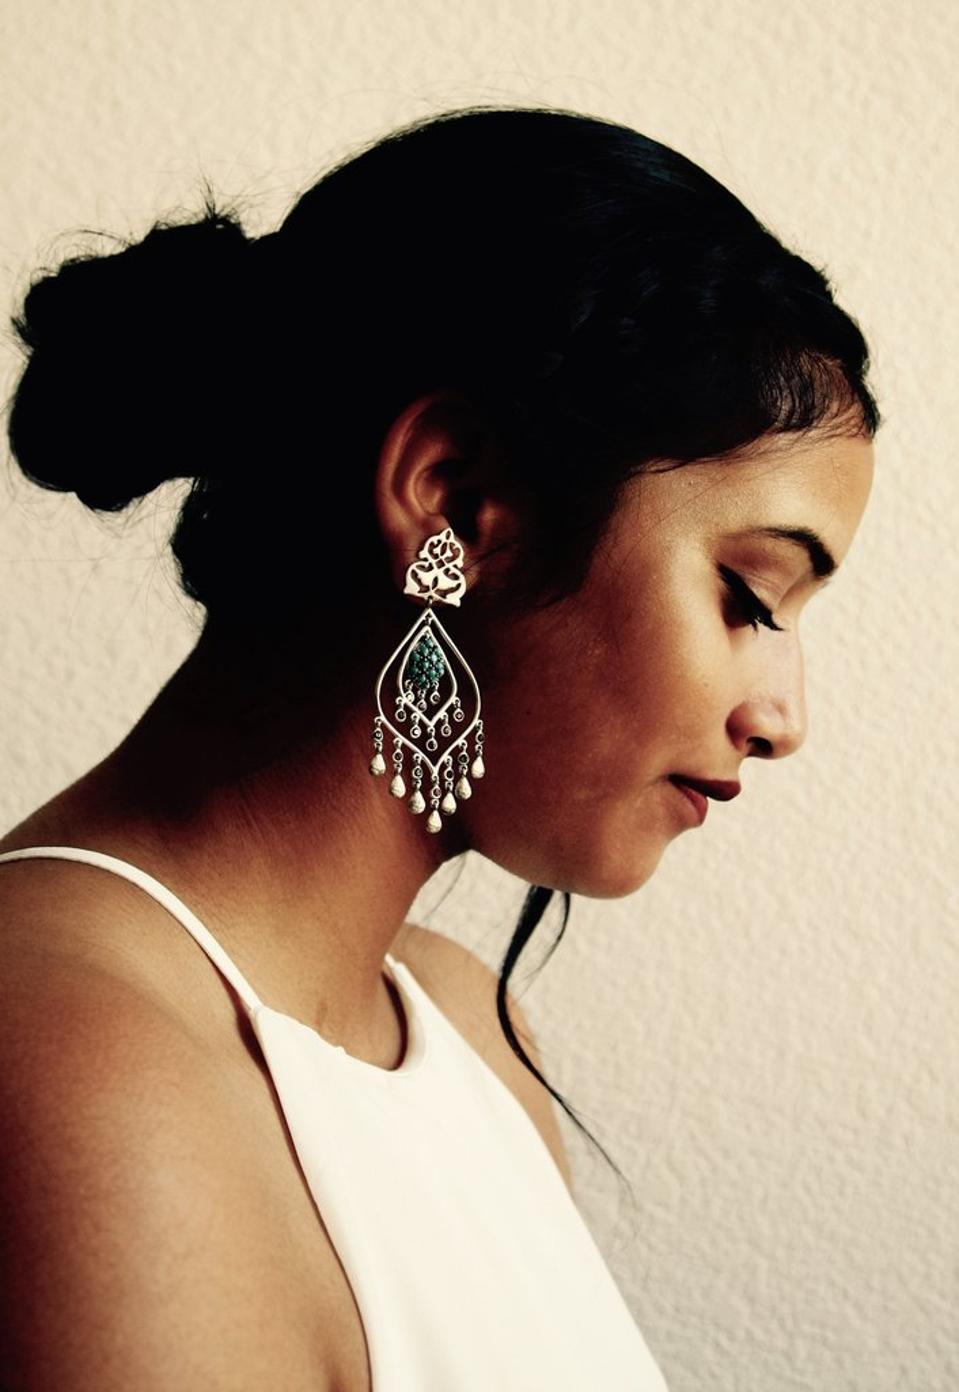 One of Lai's statement chandelier earrings.